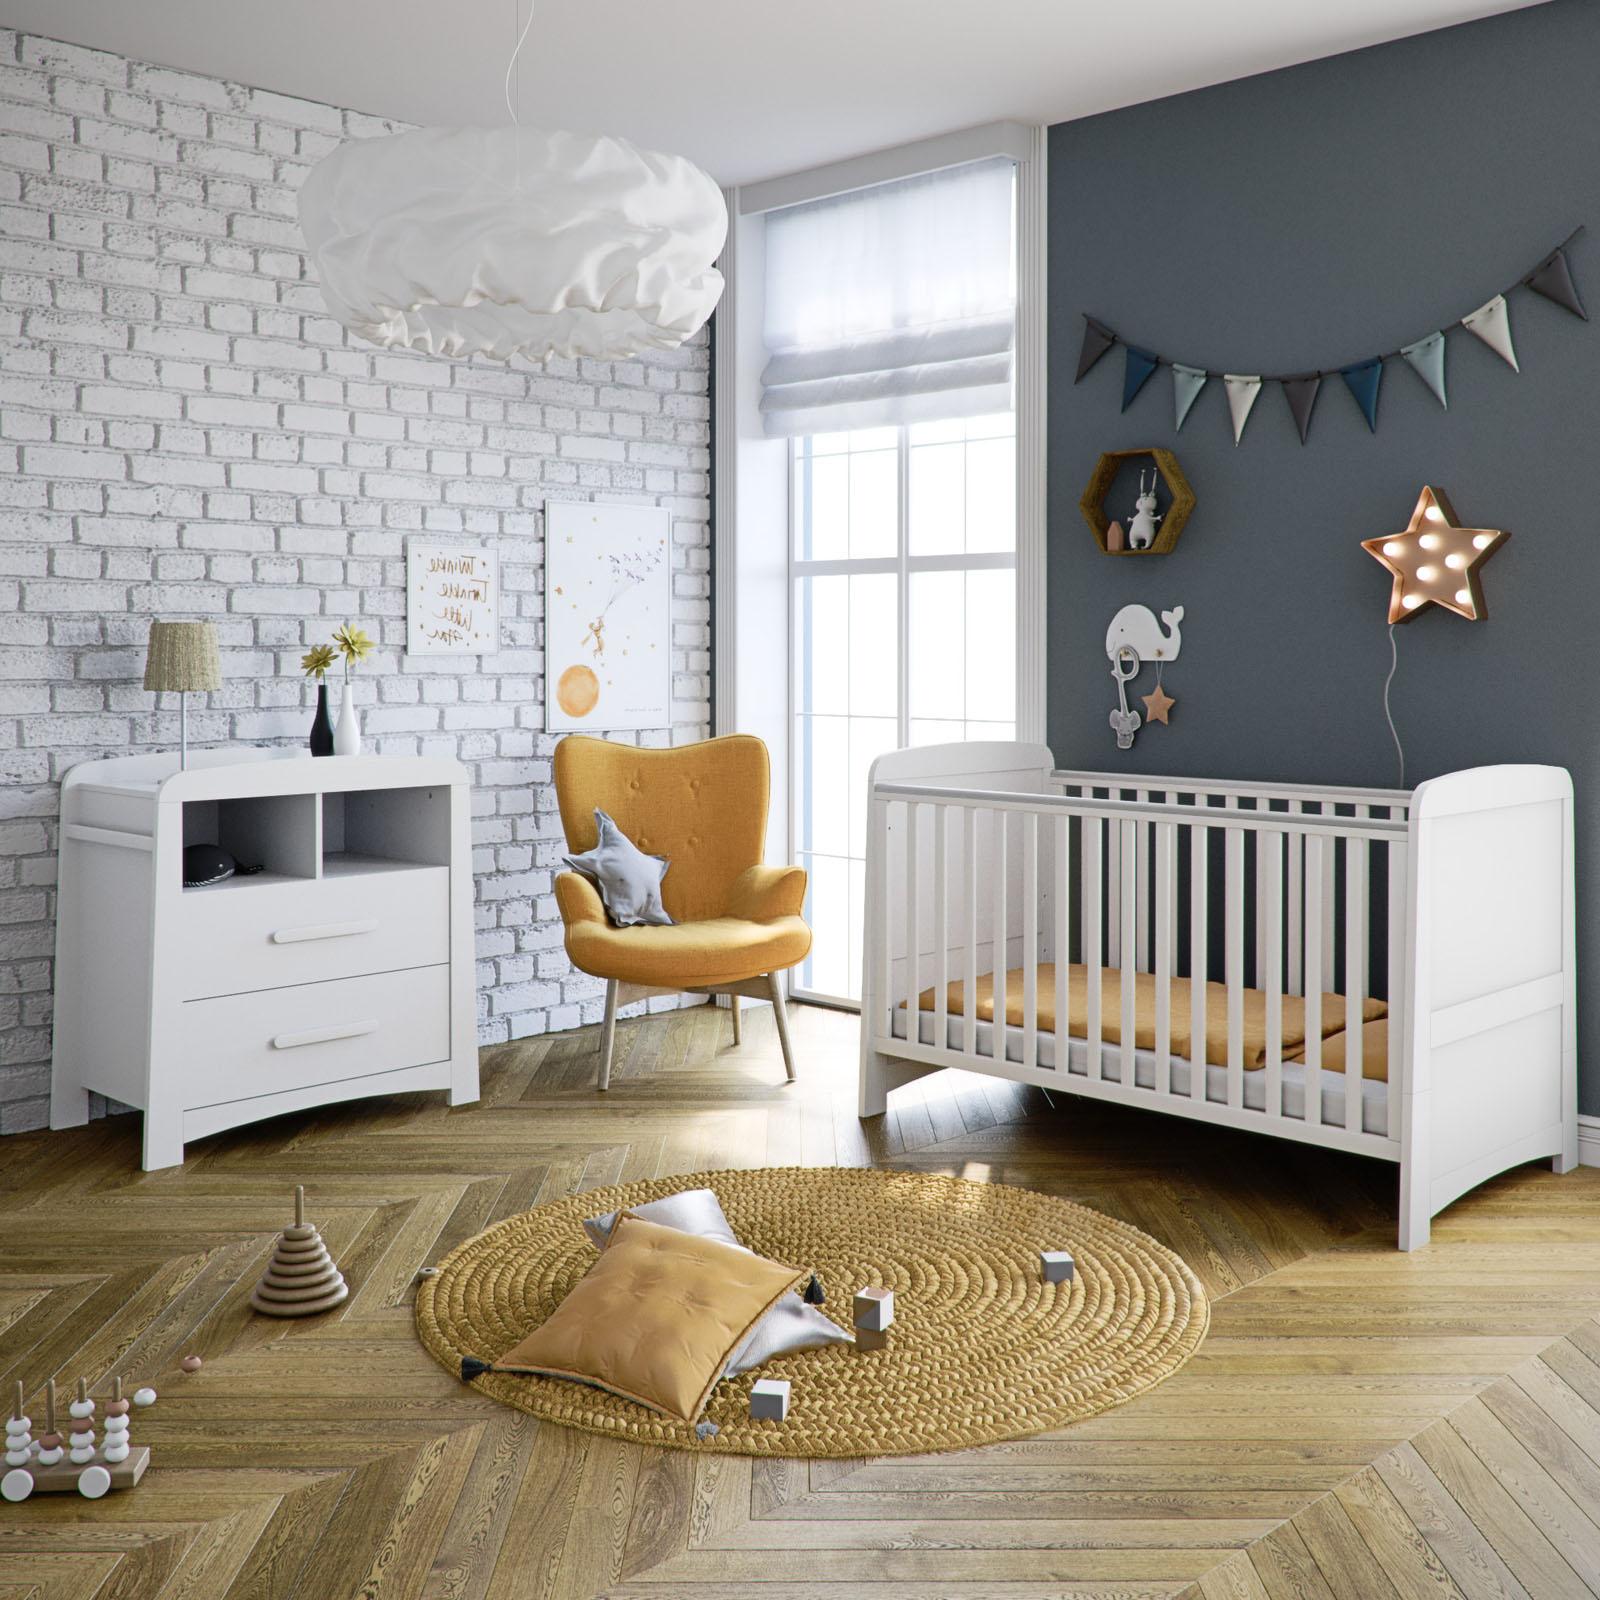 Mothercare Little Acorns Somerton Cot Bed 3 Piece Nursery